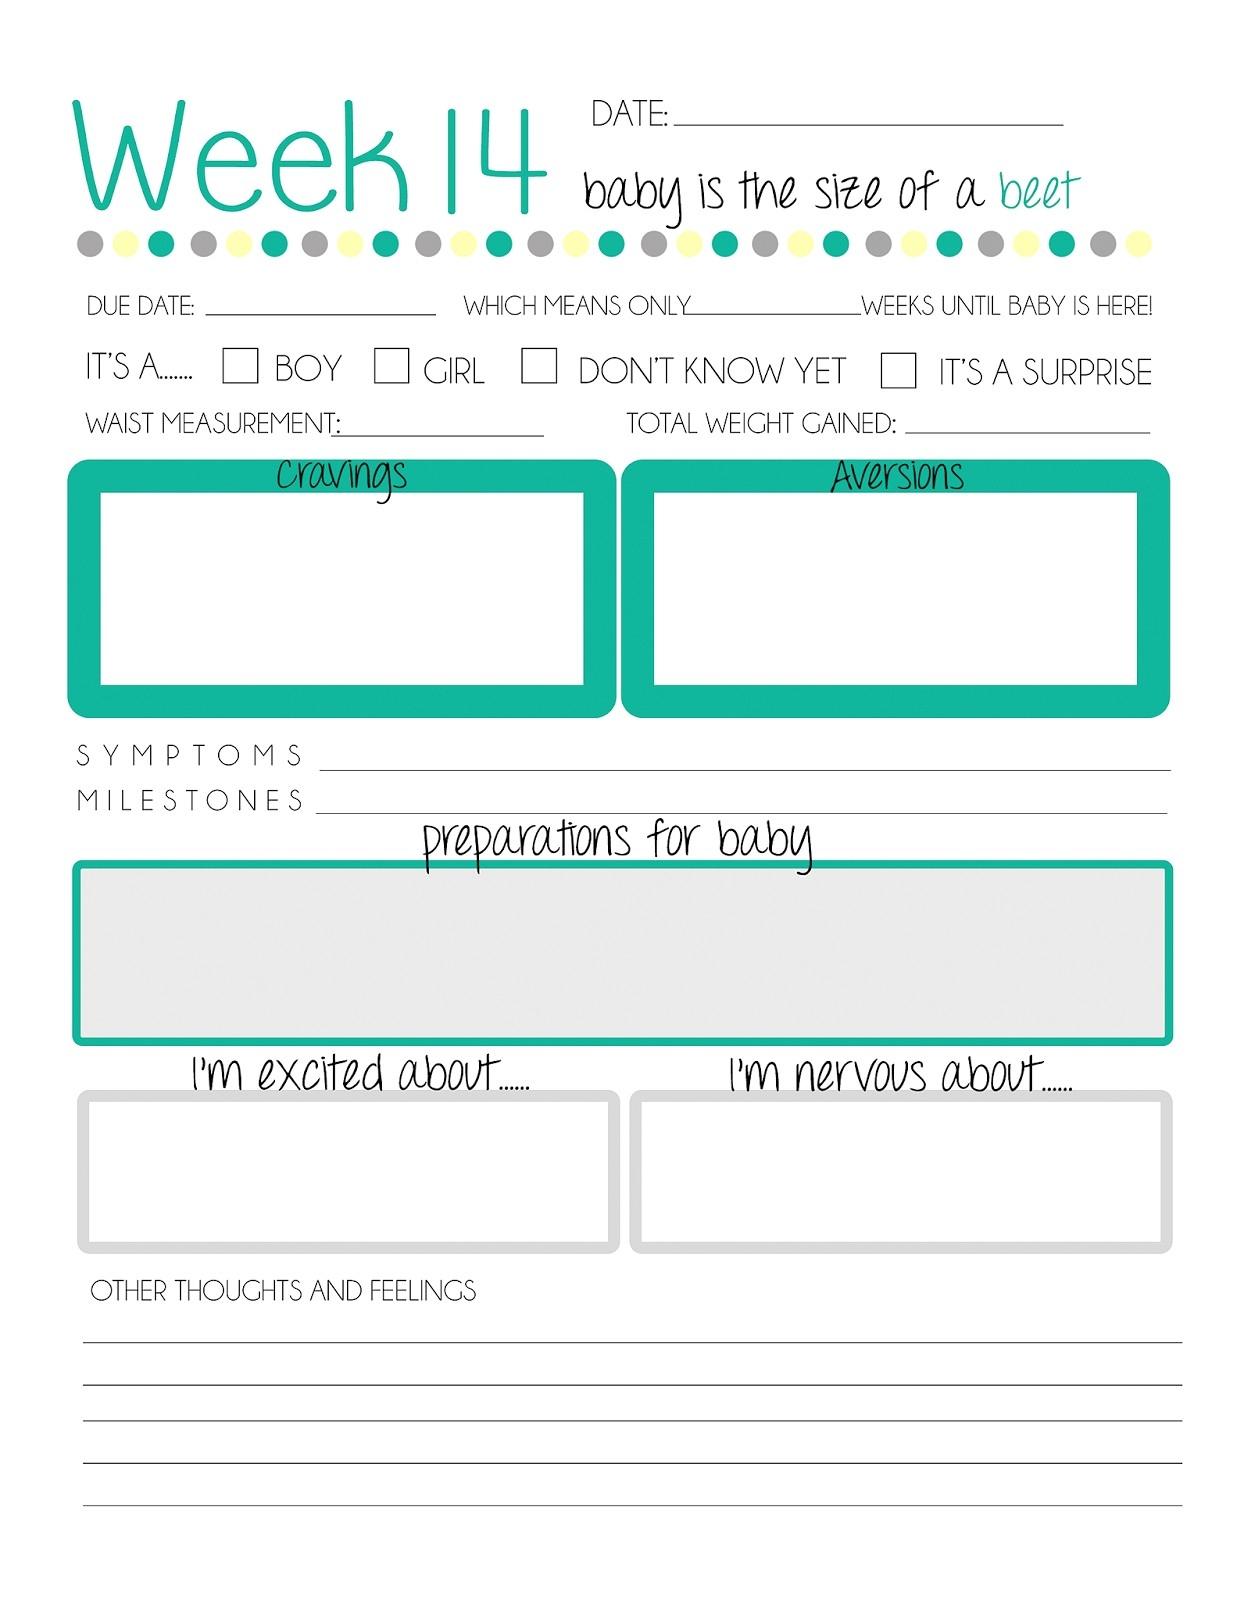 Baby Countdown Calendar Printable | Igotlockedout